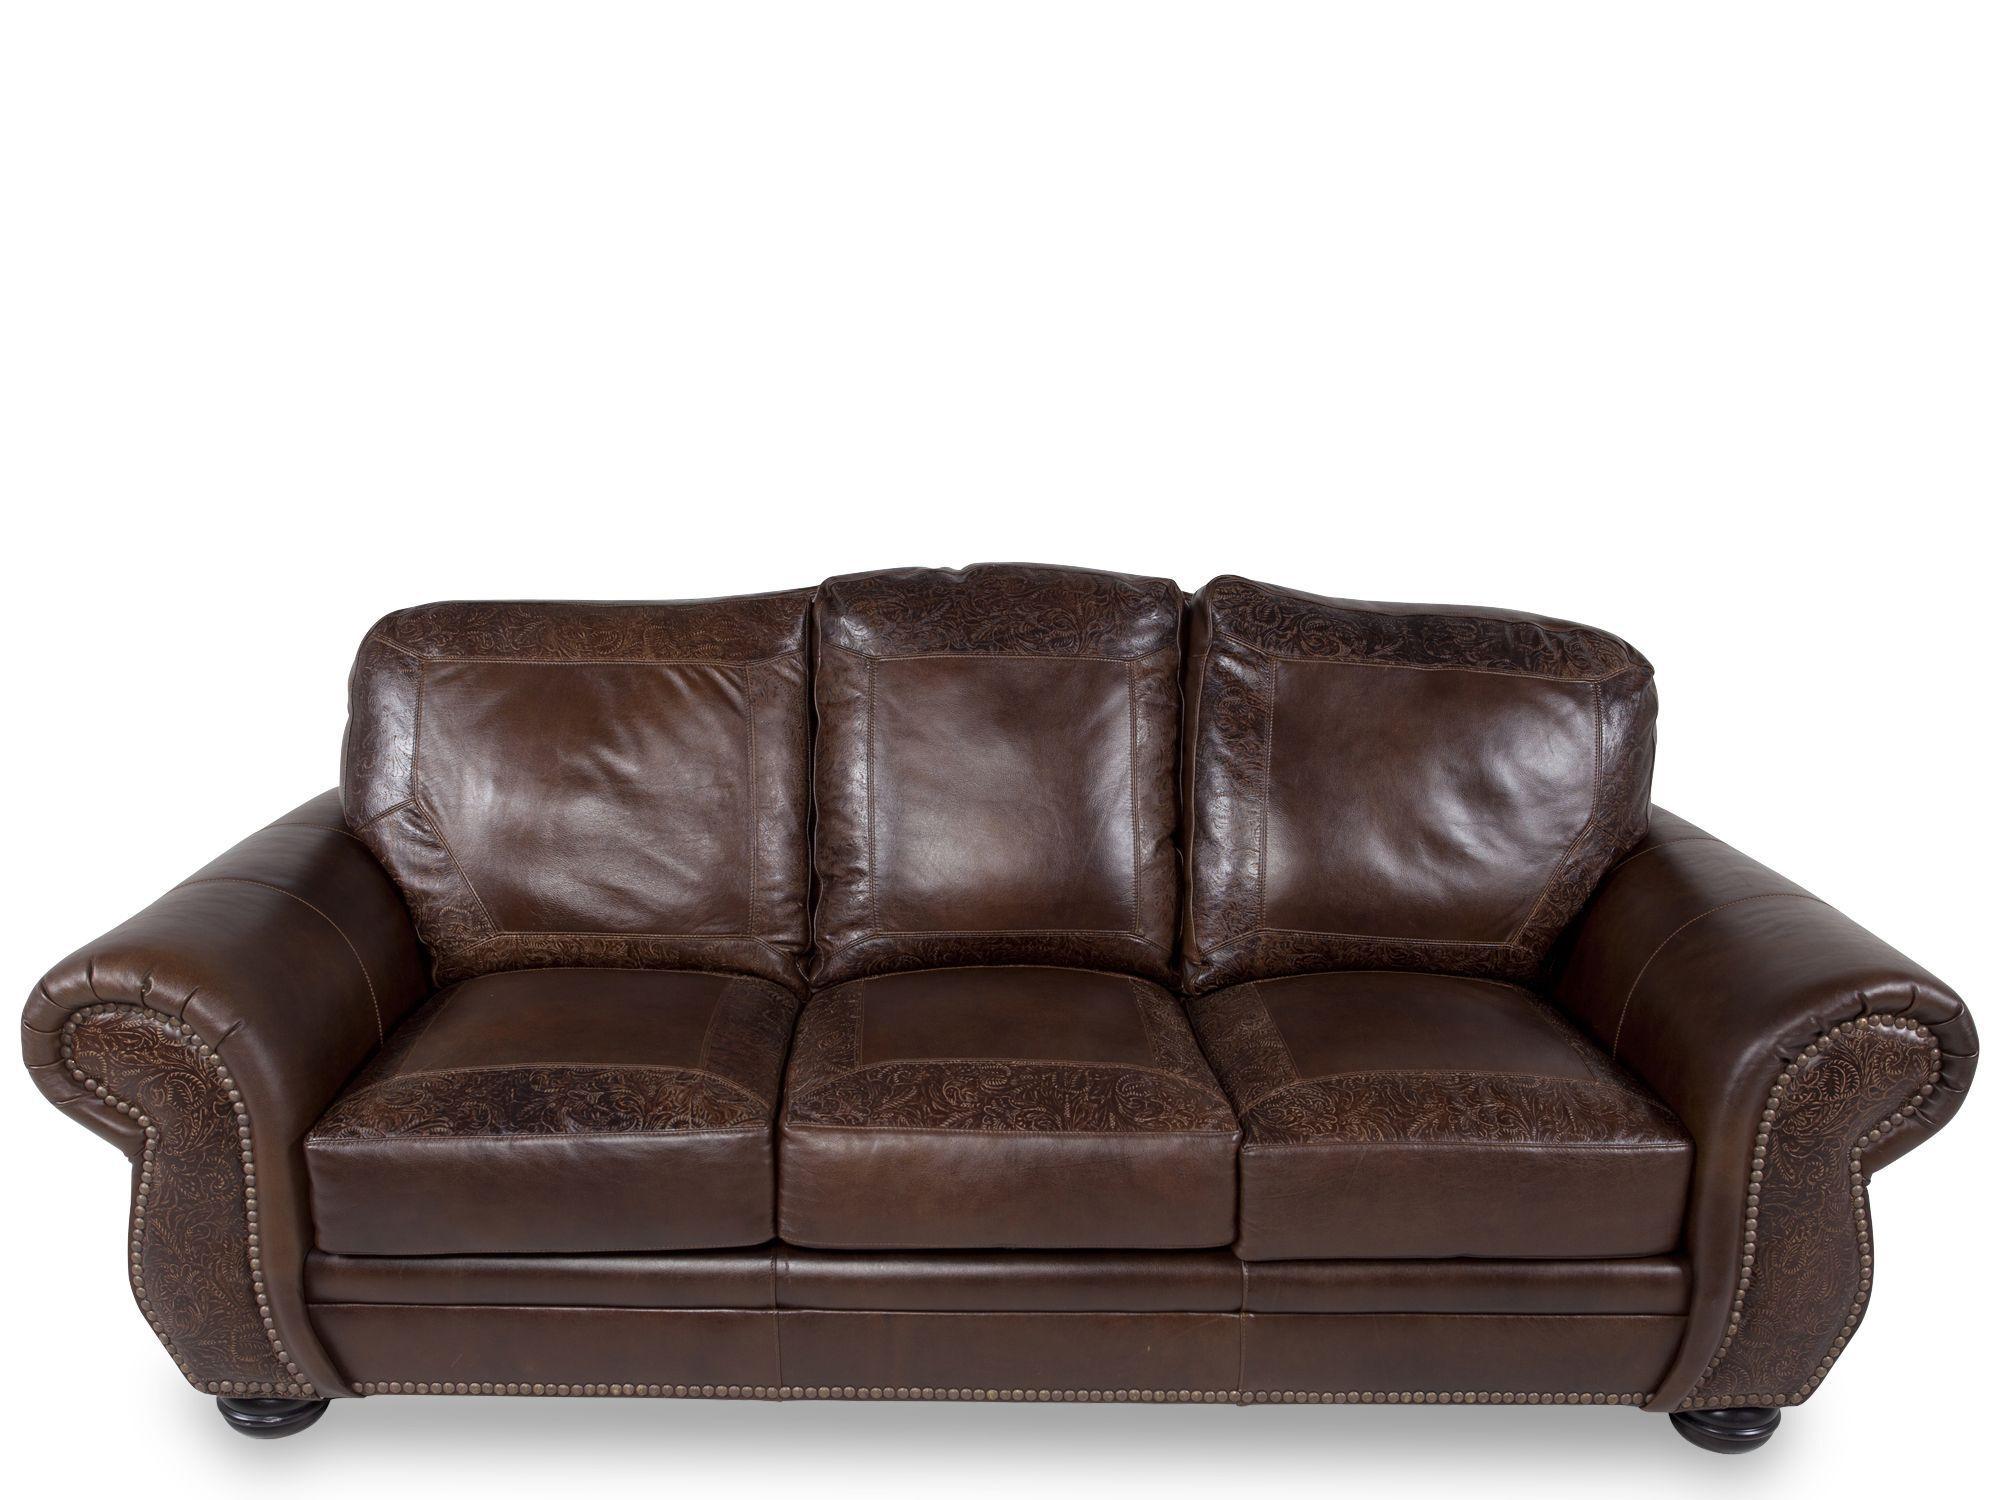 PaisleyPrinted Leather 94 Sofa in Dark Burgundy  Mathis